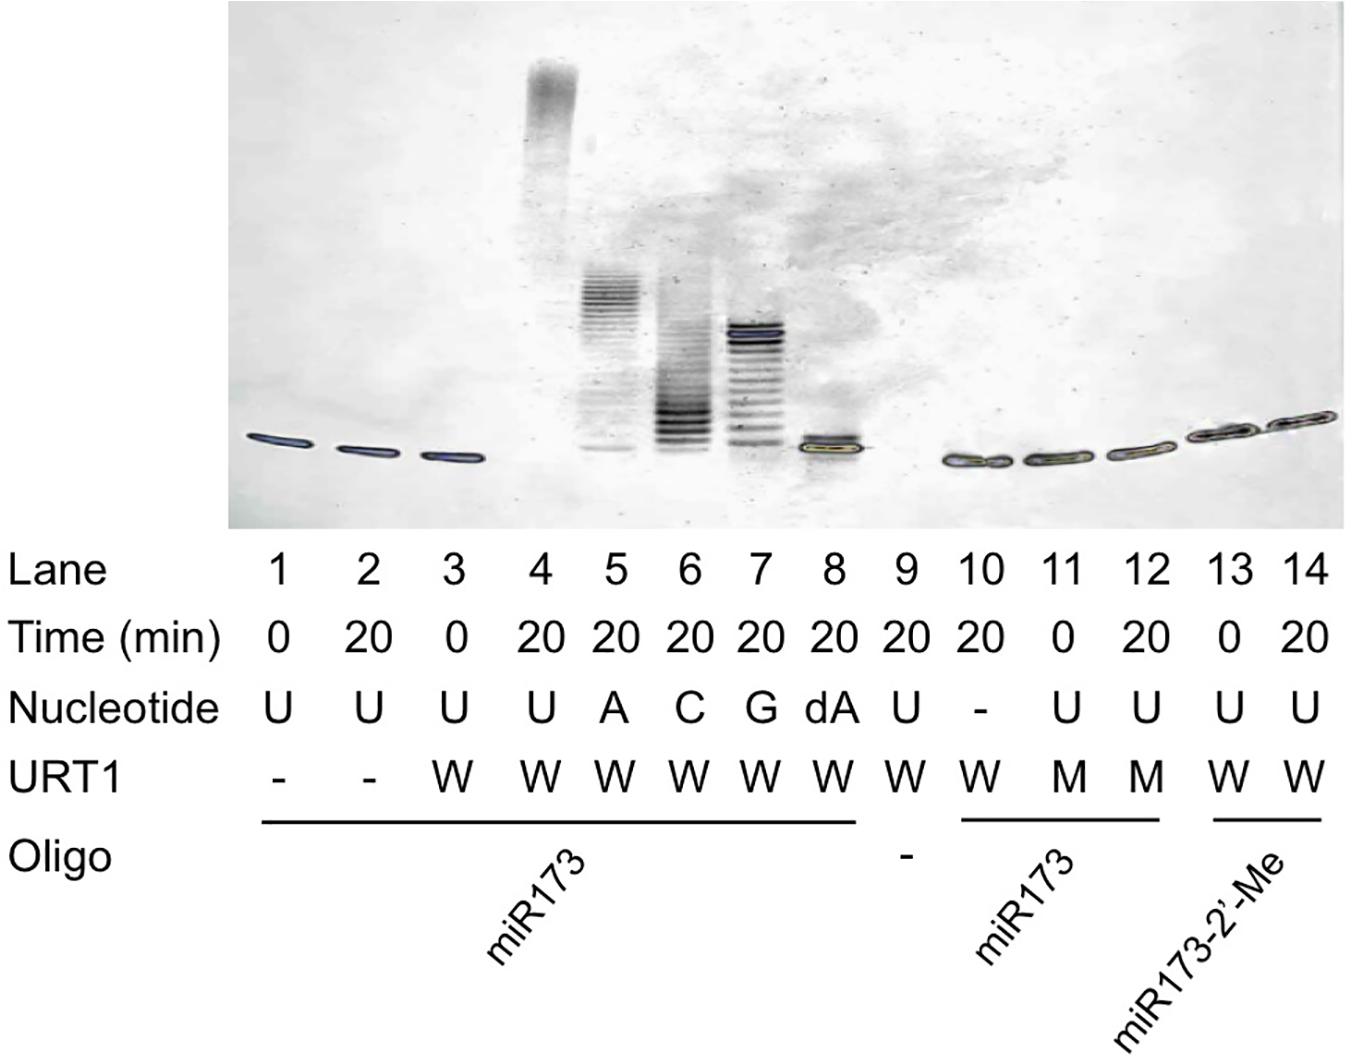 Nucleotidyl transferase assays for URT1.